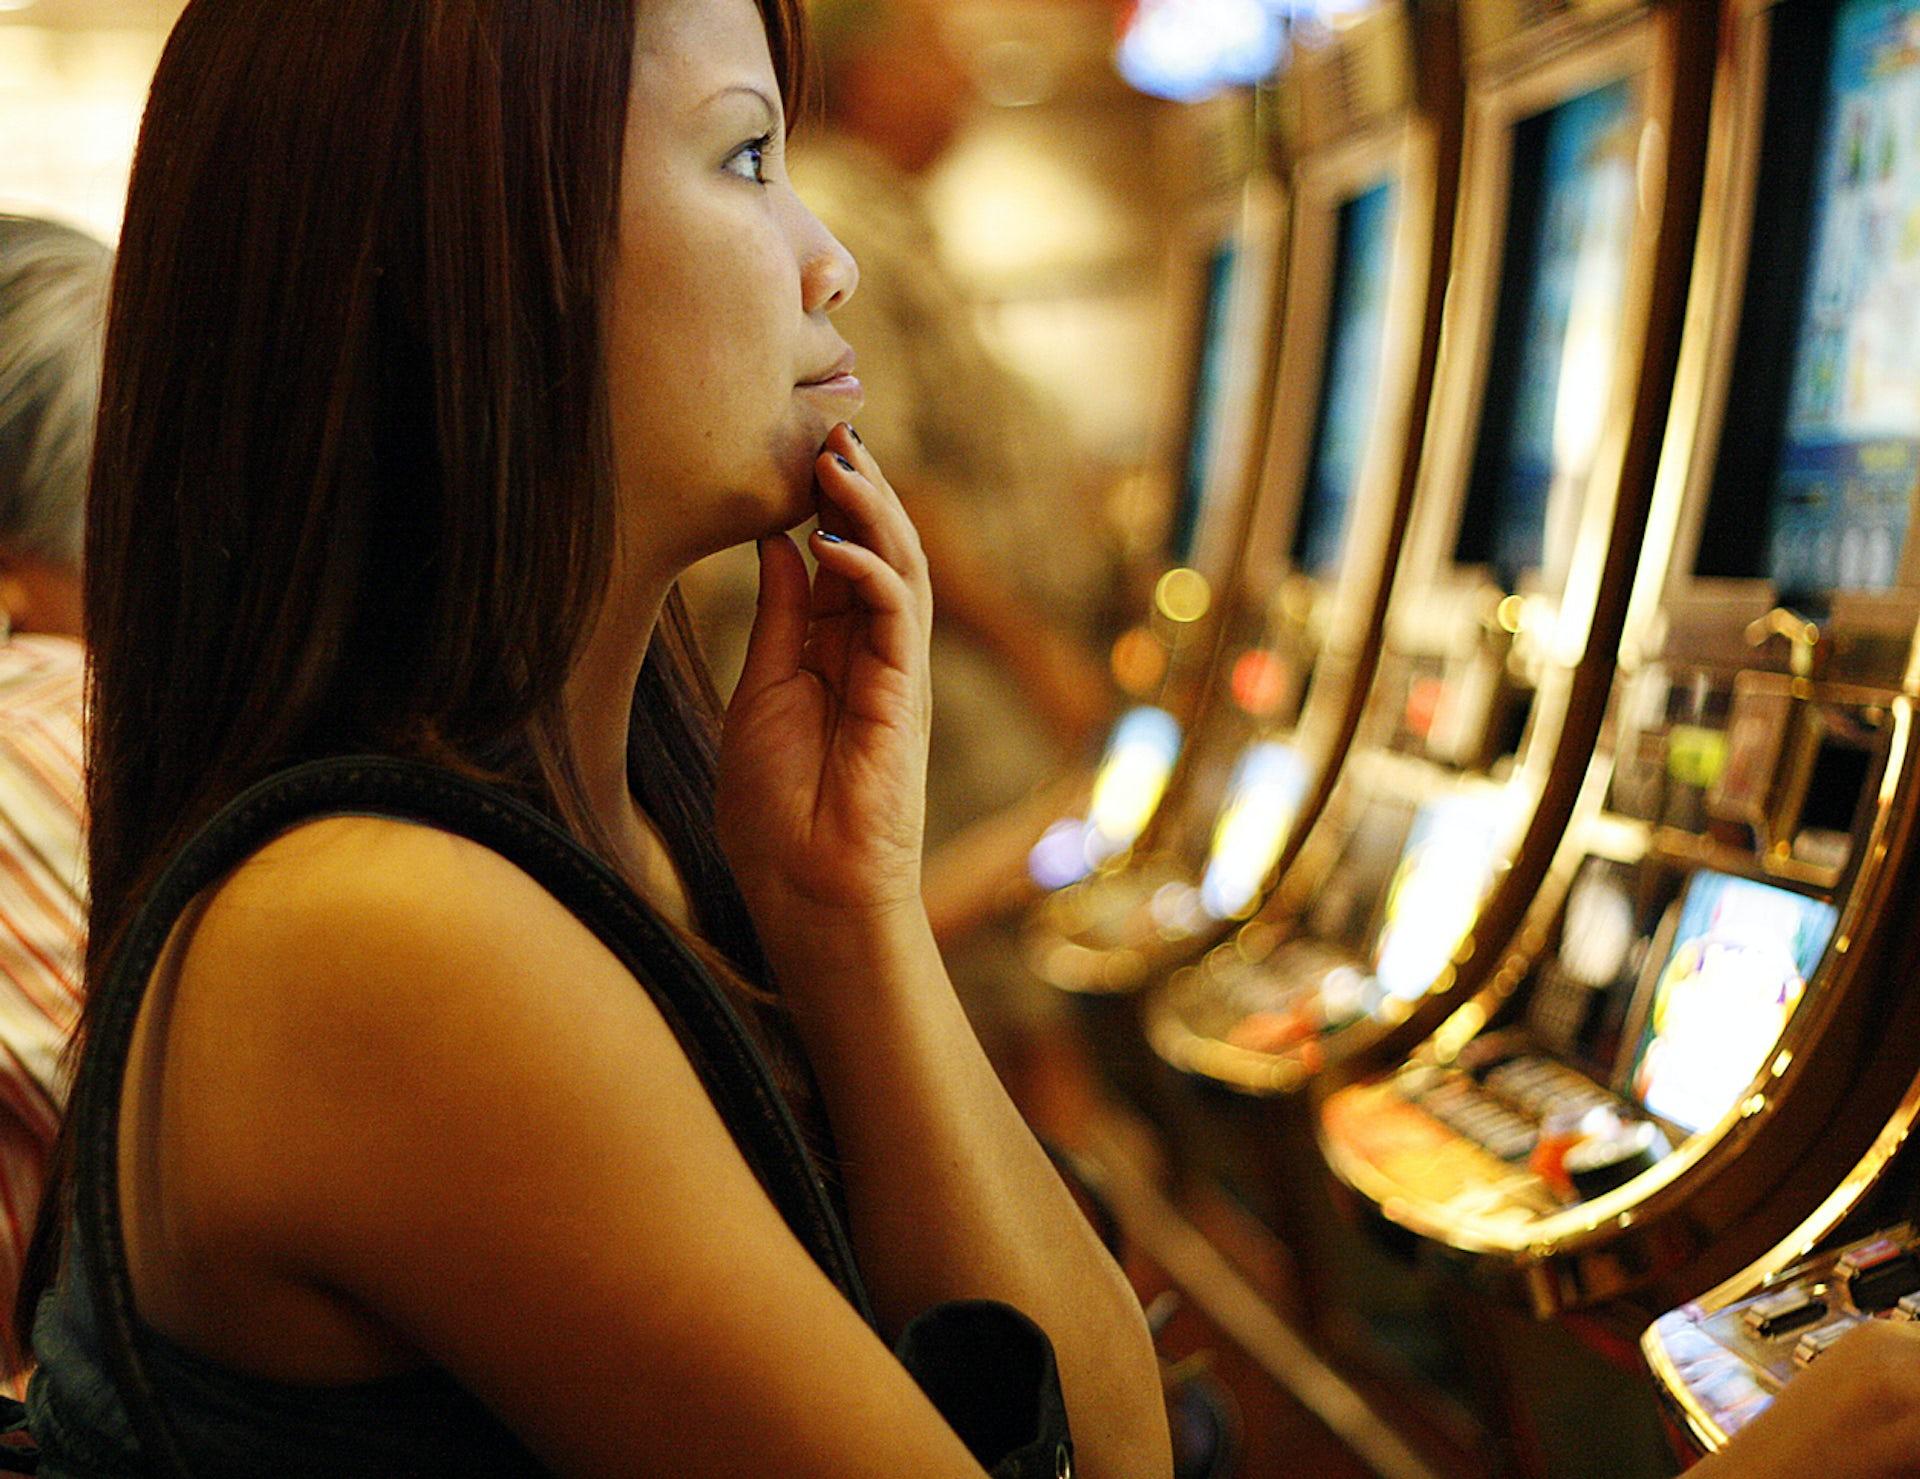 slots.lv no deposit bonus codes 2020